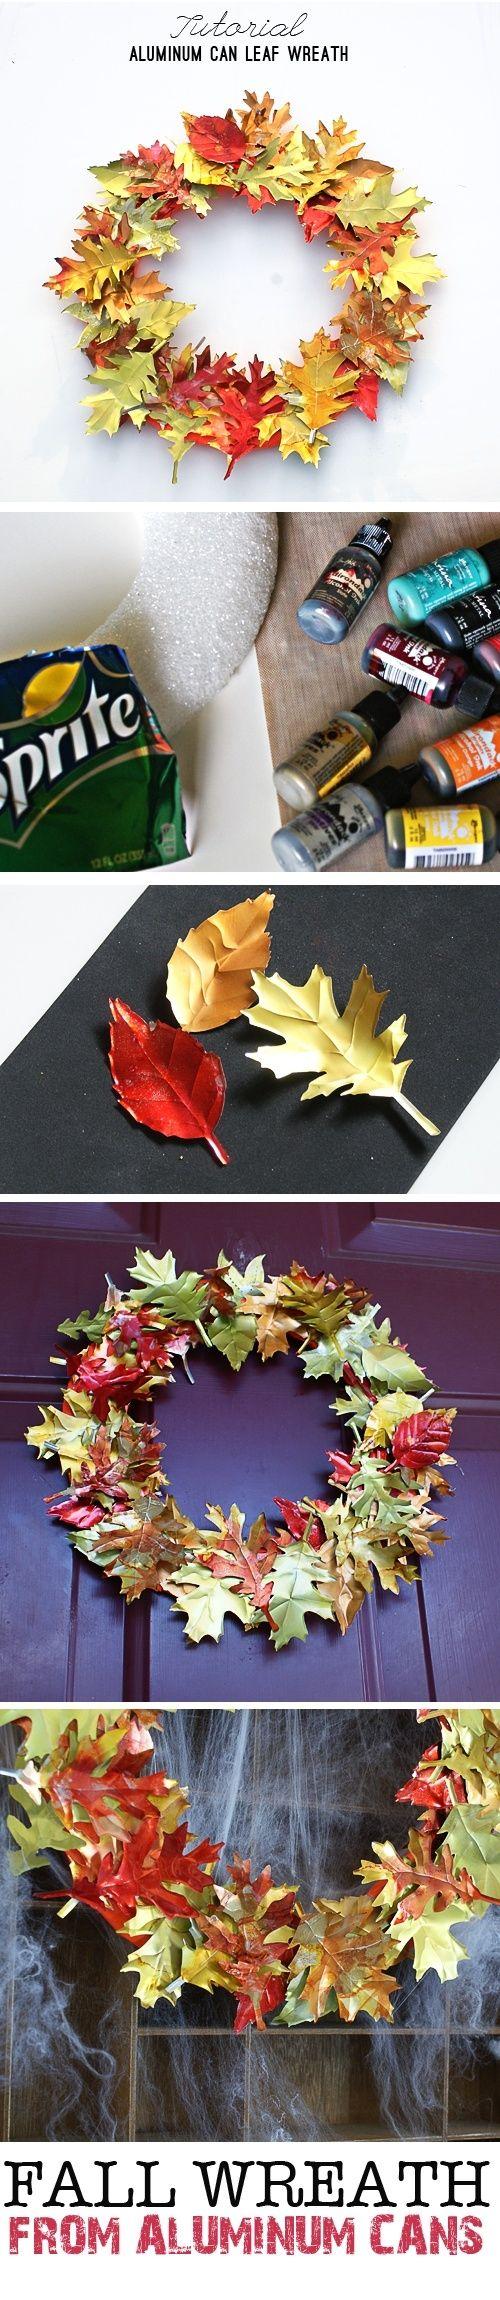 Autumn leaf wreath from aluminum cans